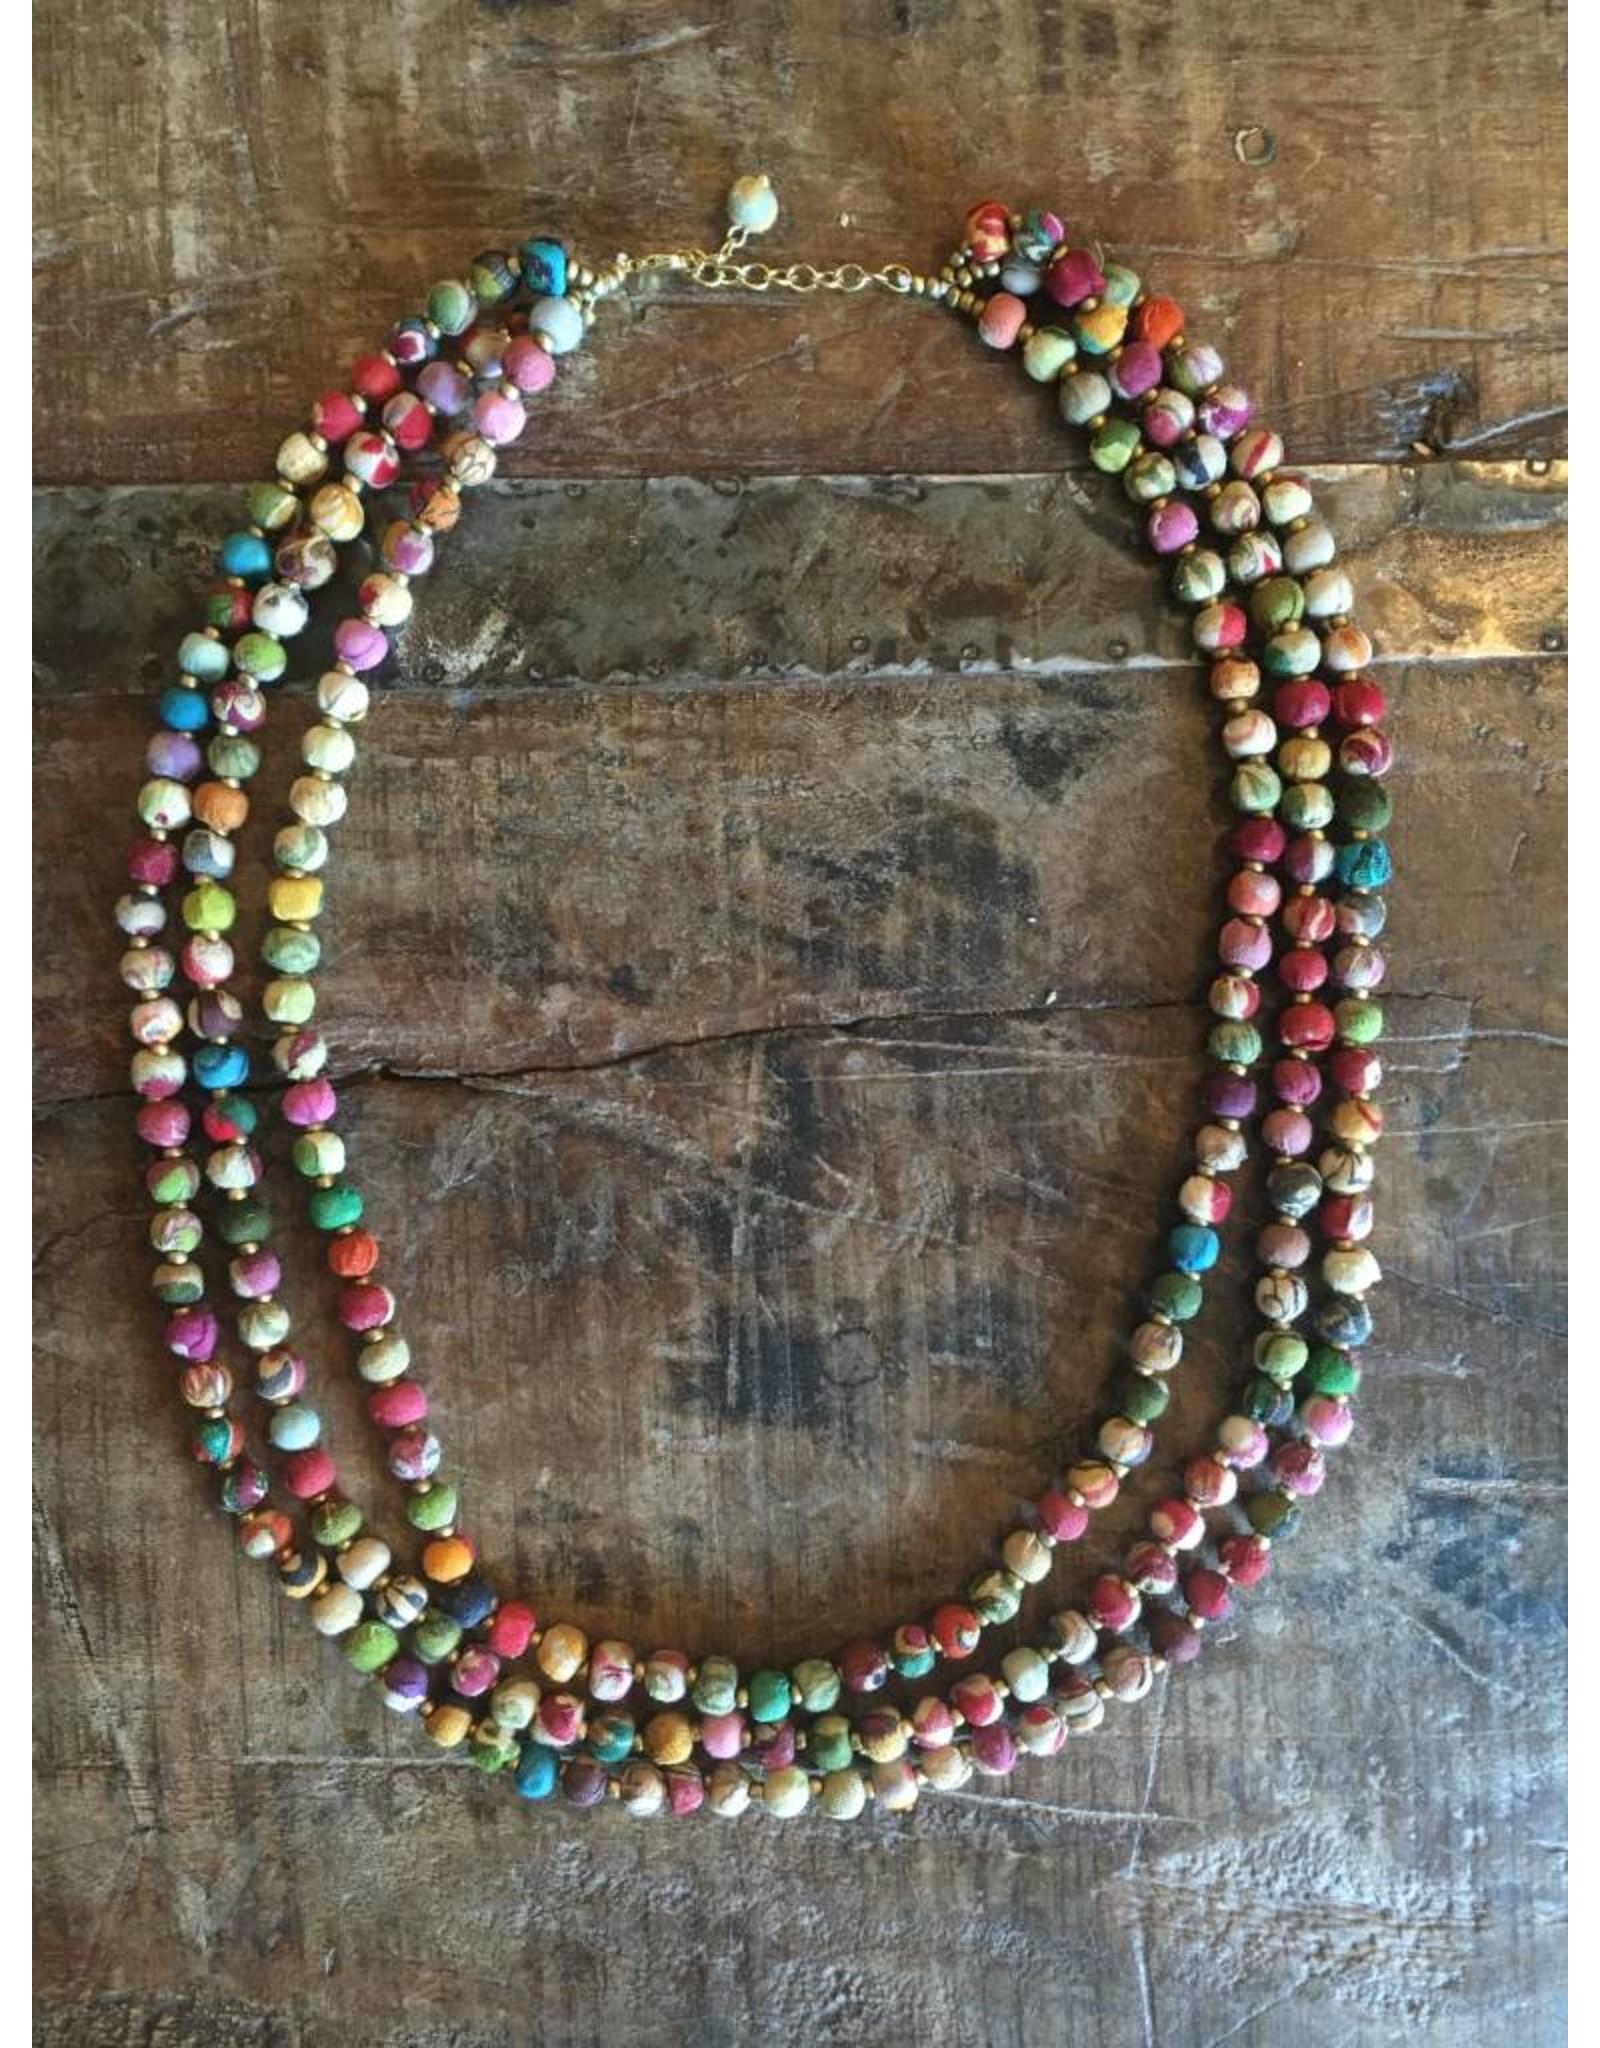 Sari Triple Strand Necklace, India